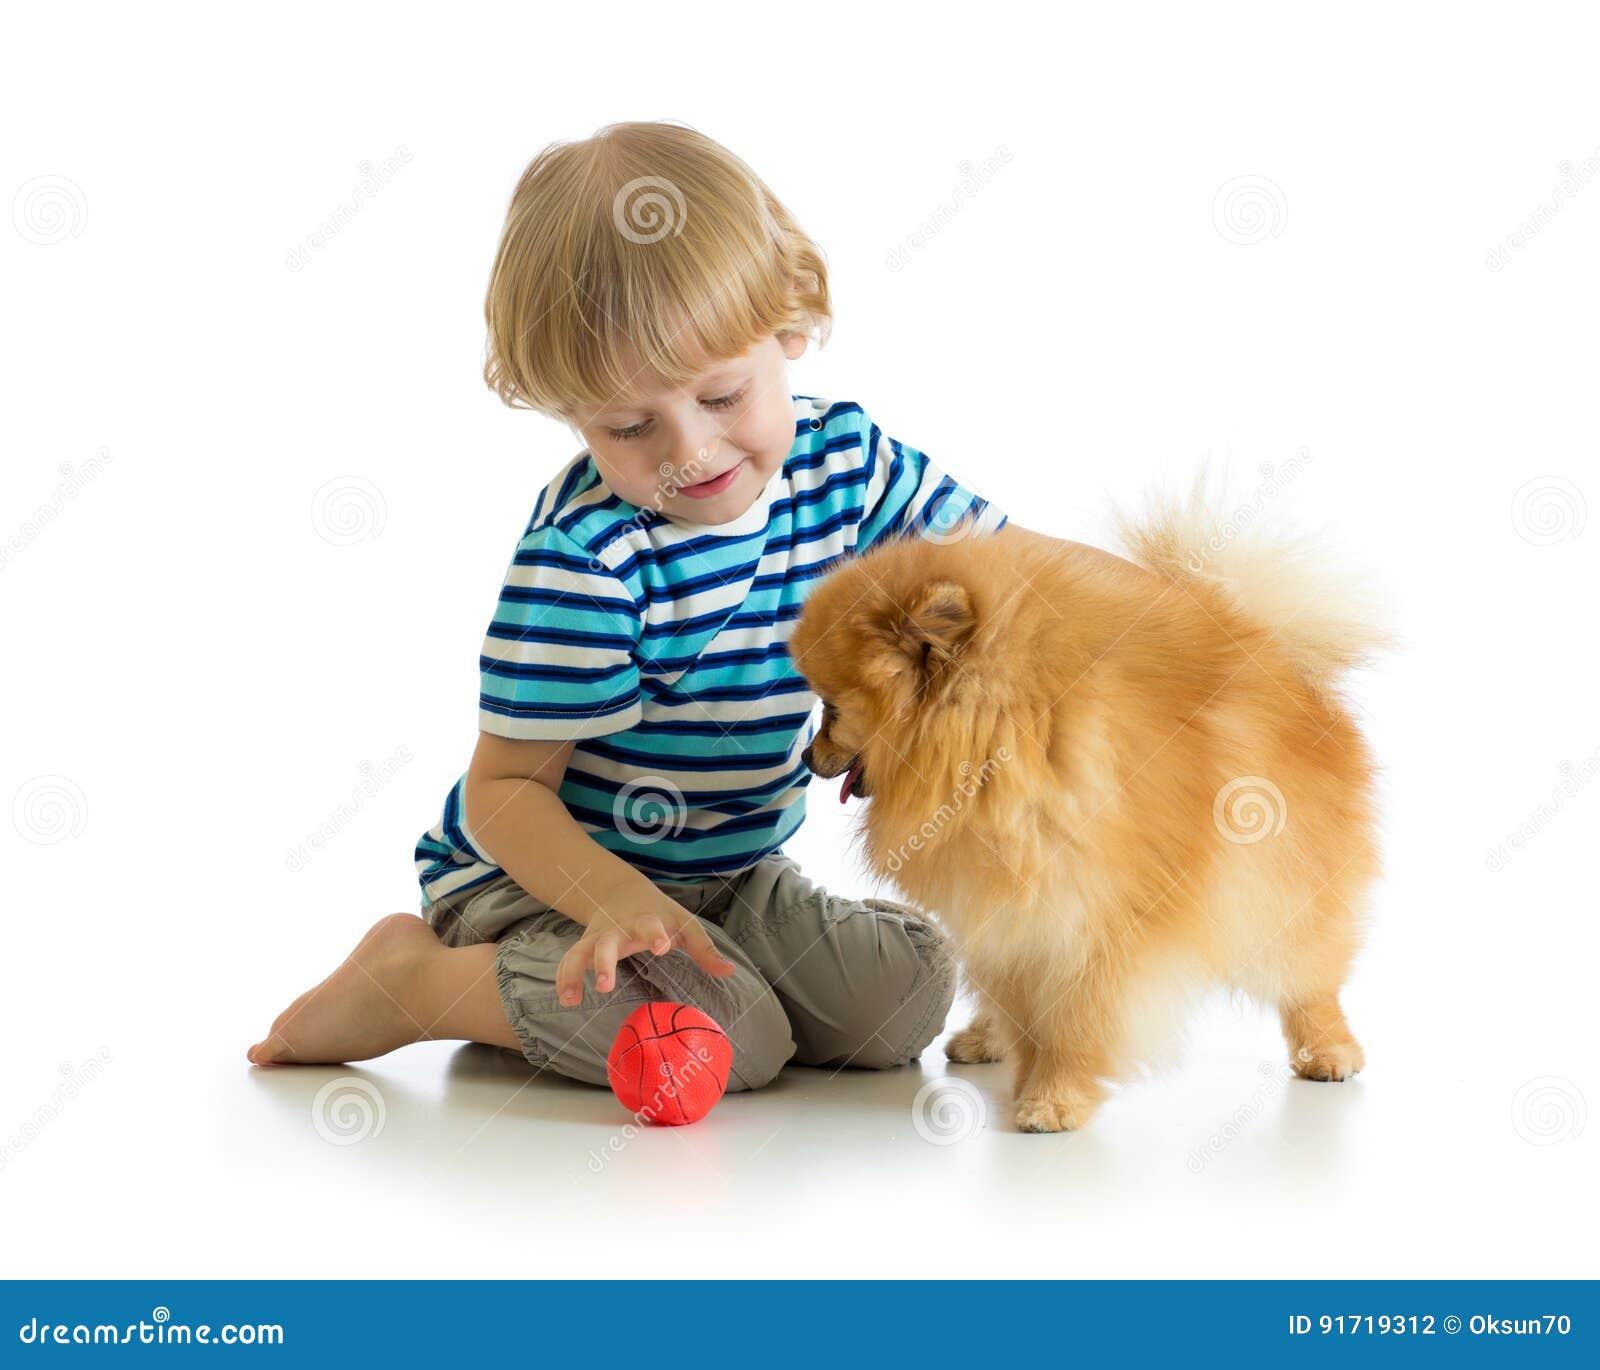 Little boy playing with dog spitz, isolated on white background